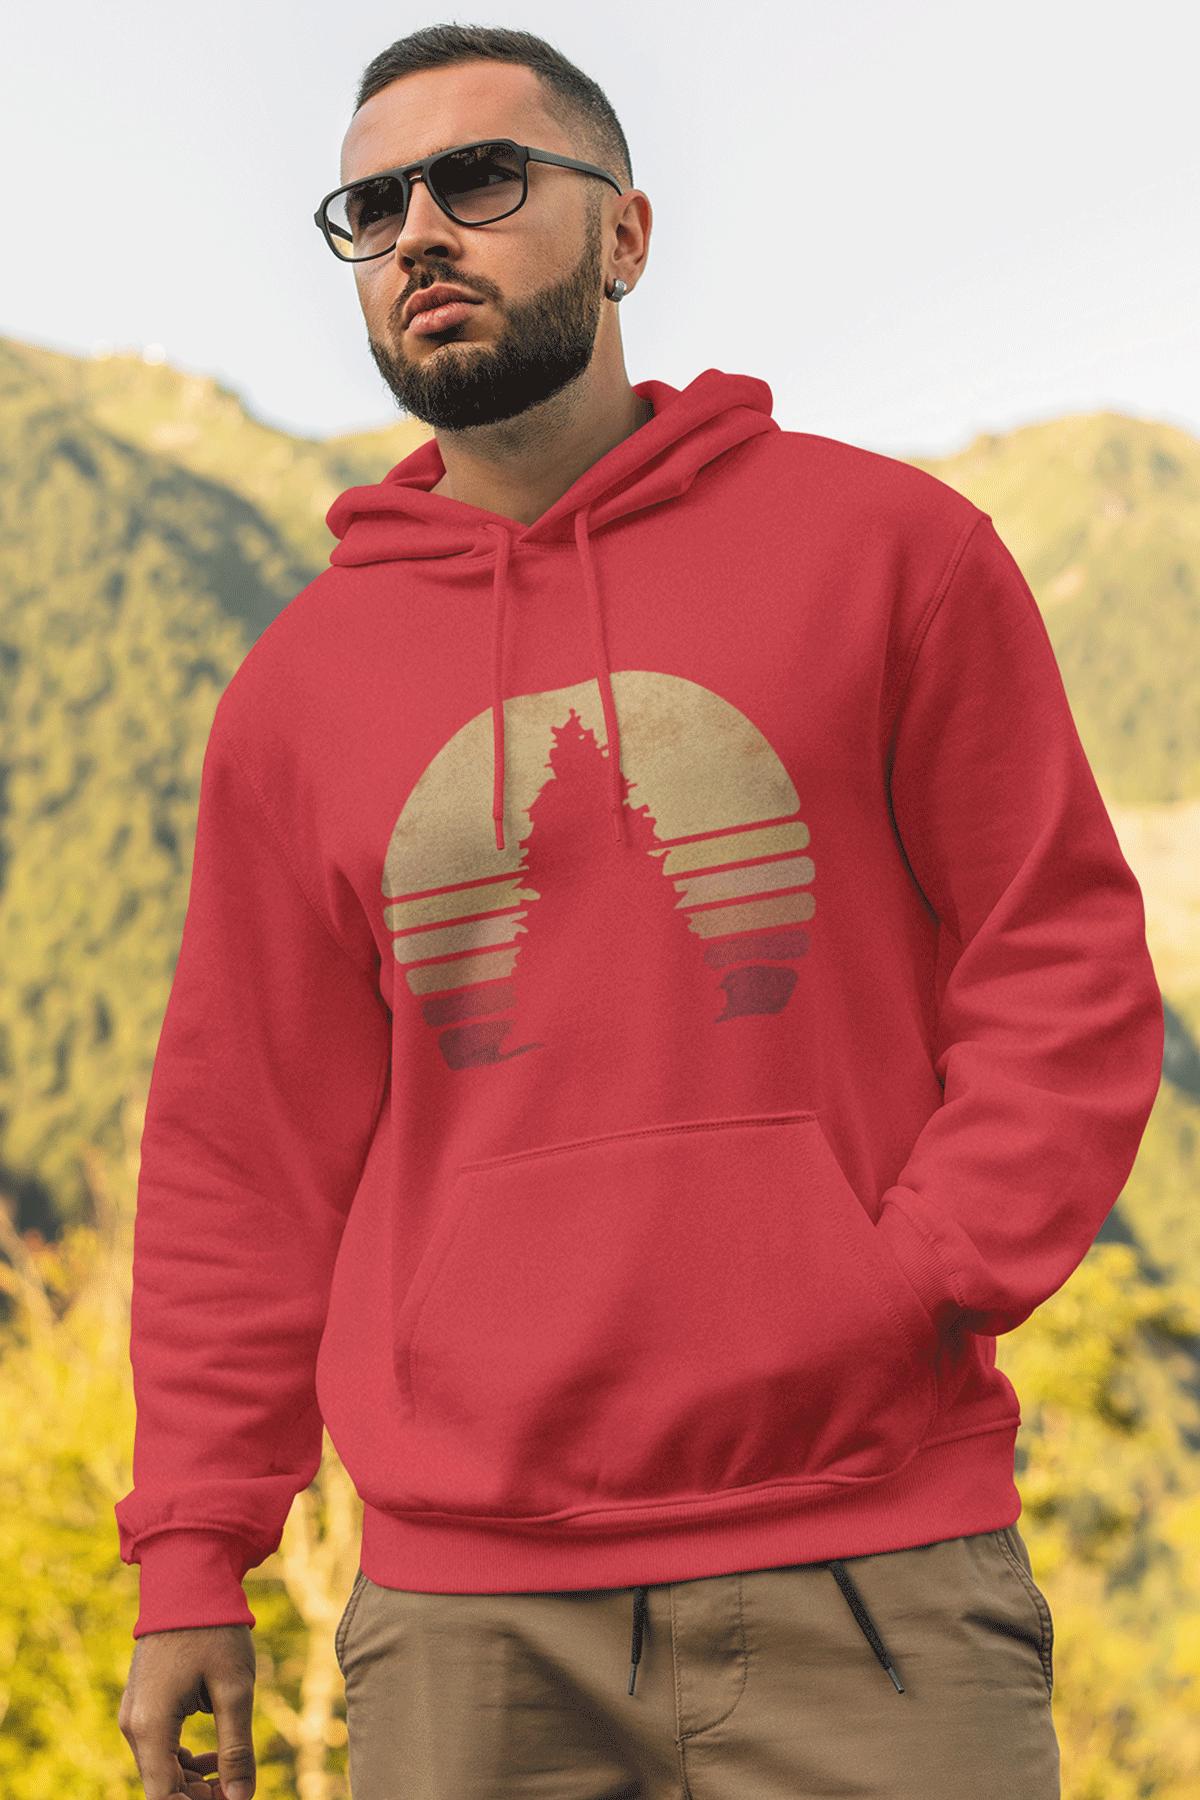 Sunset Kırmızı Erkek Kapşonlu Sweatshirt - Hoodie